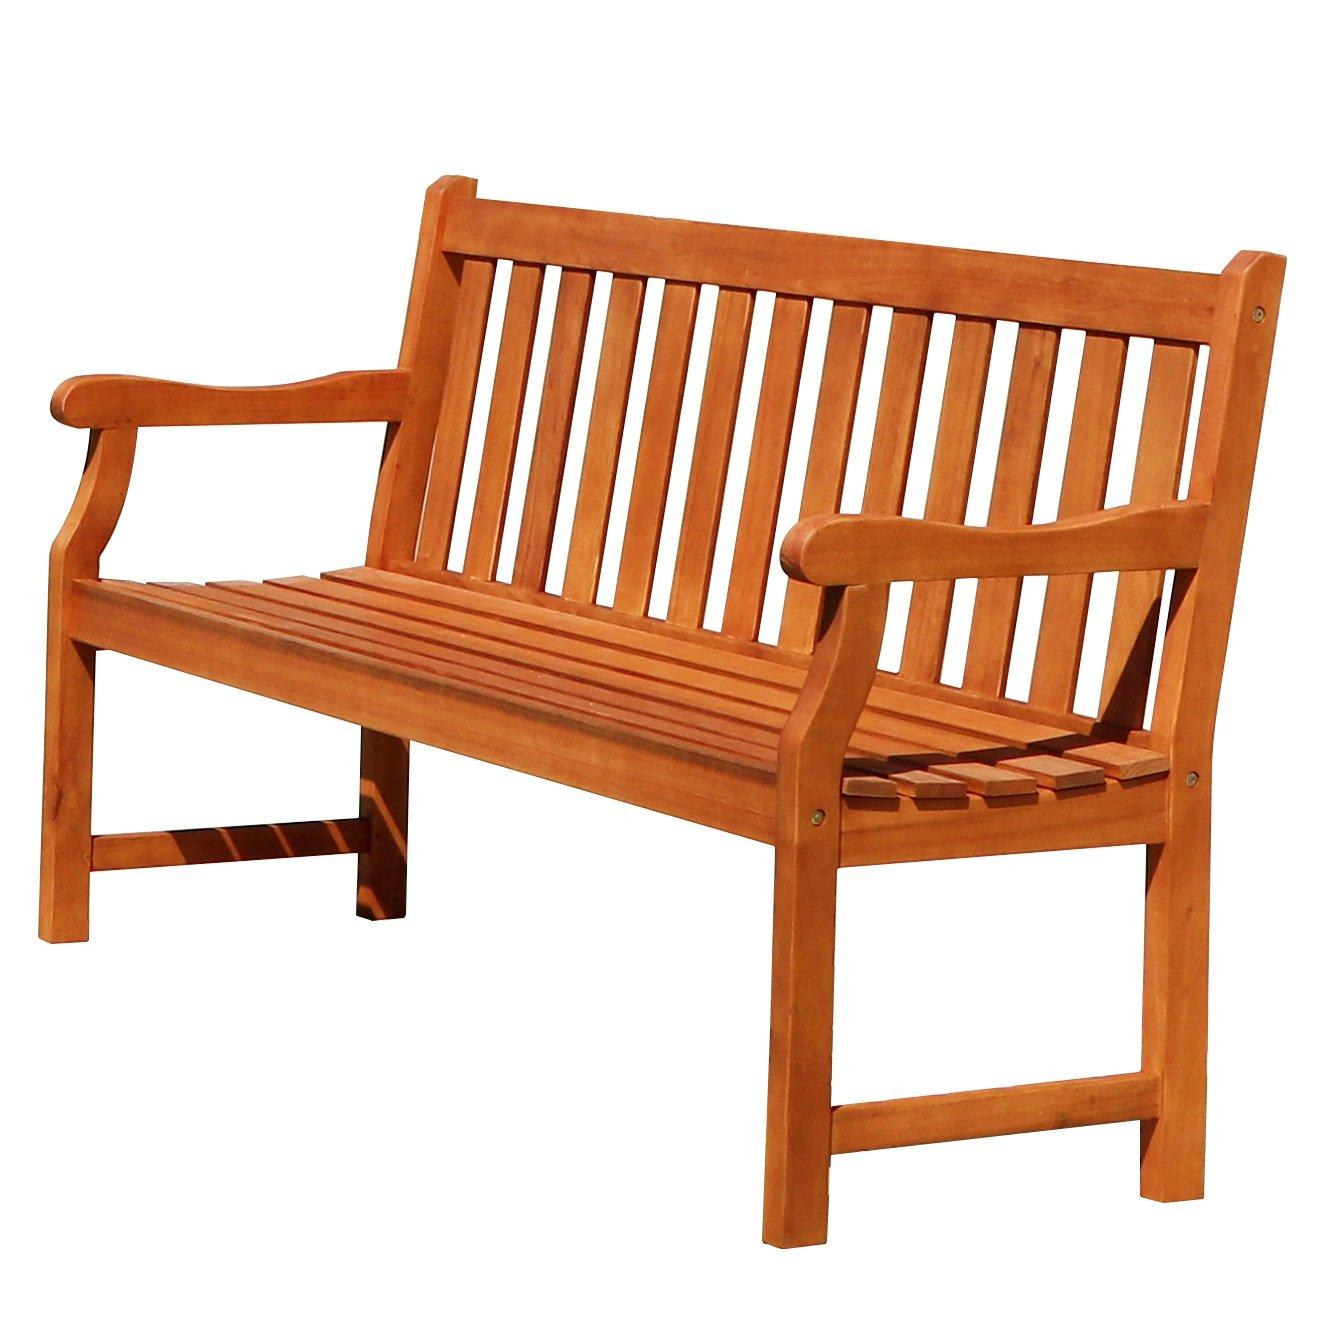 Vifah Baltic Eco-Friendly 5-Foot Outdoor Wood Garden Bench